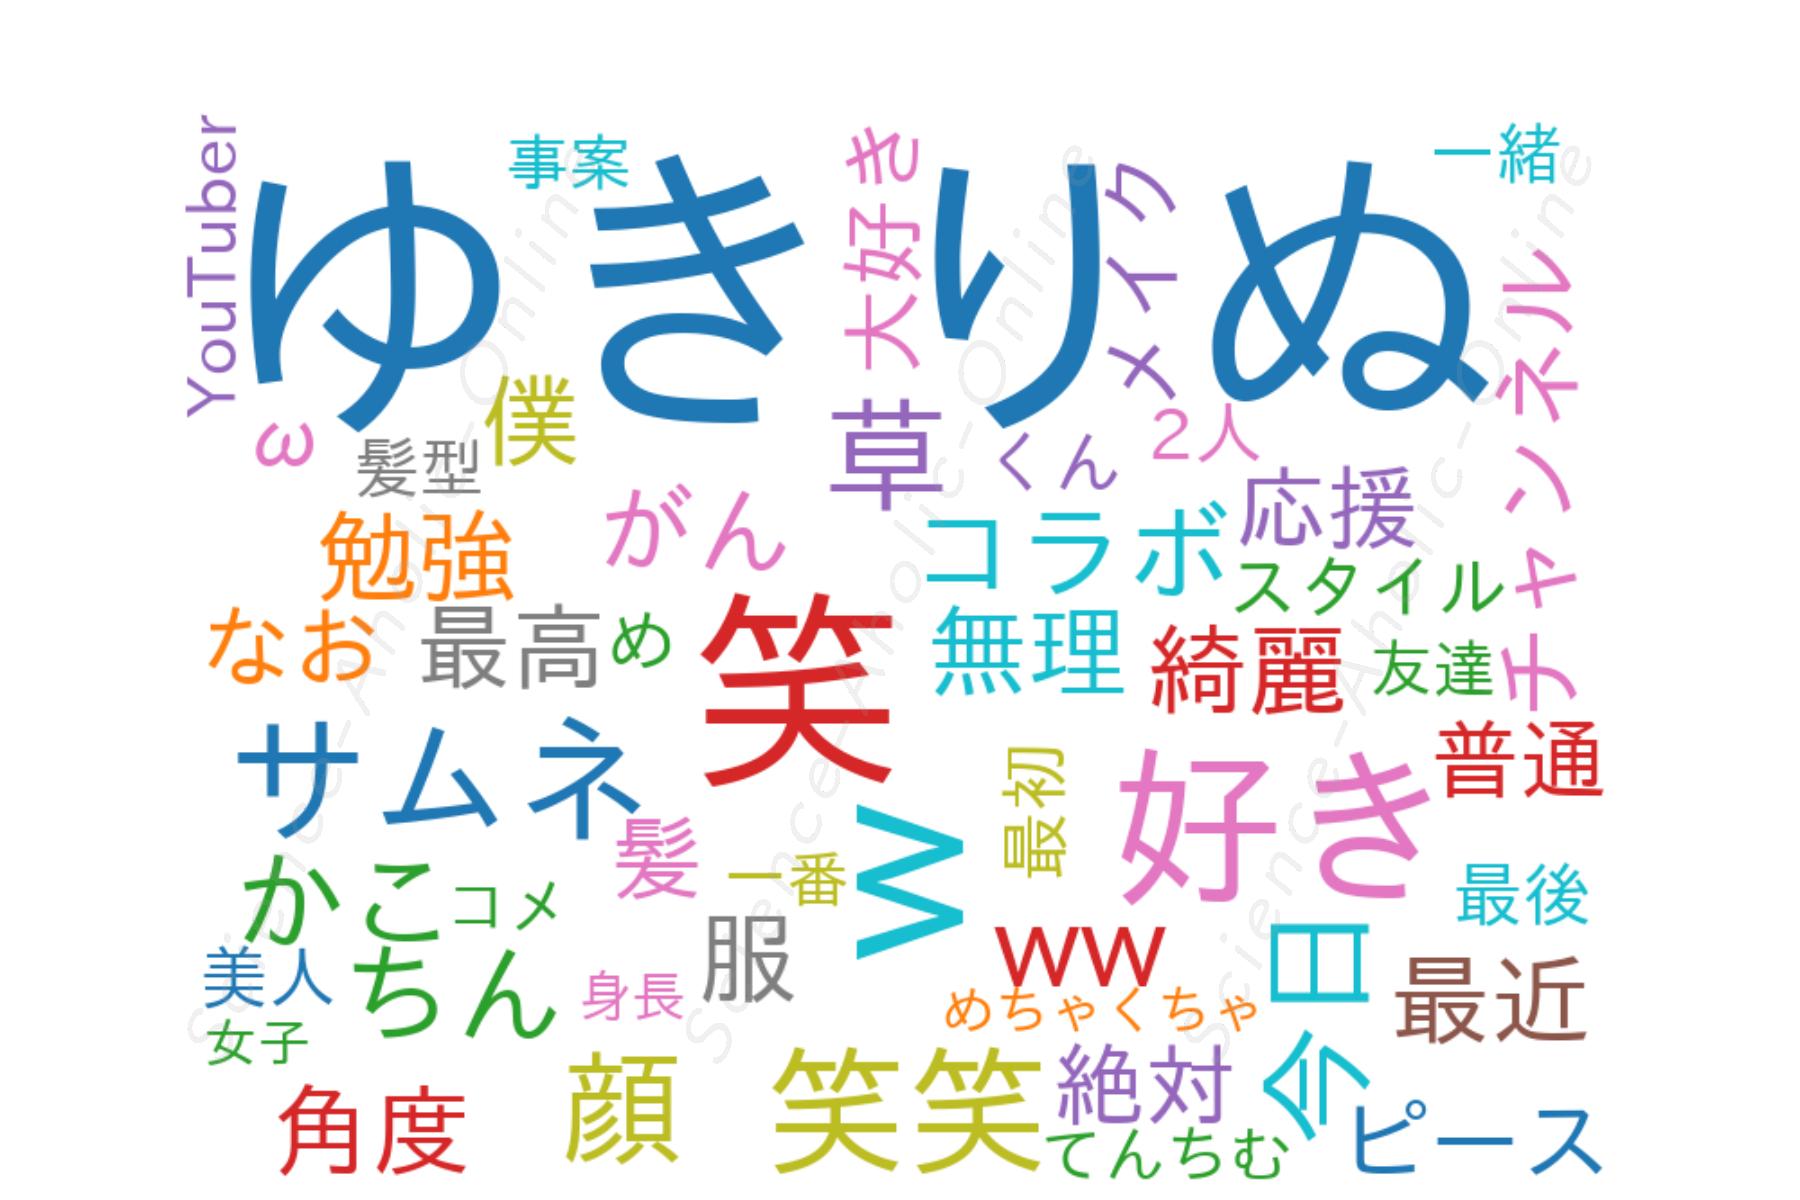 wordcloud_ゆきりぬ